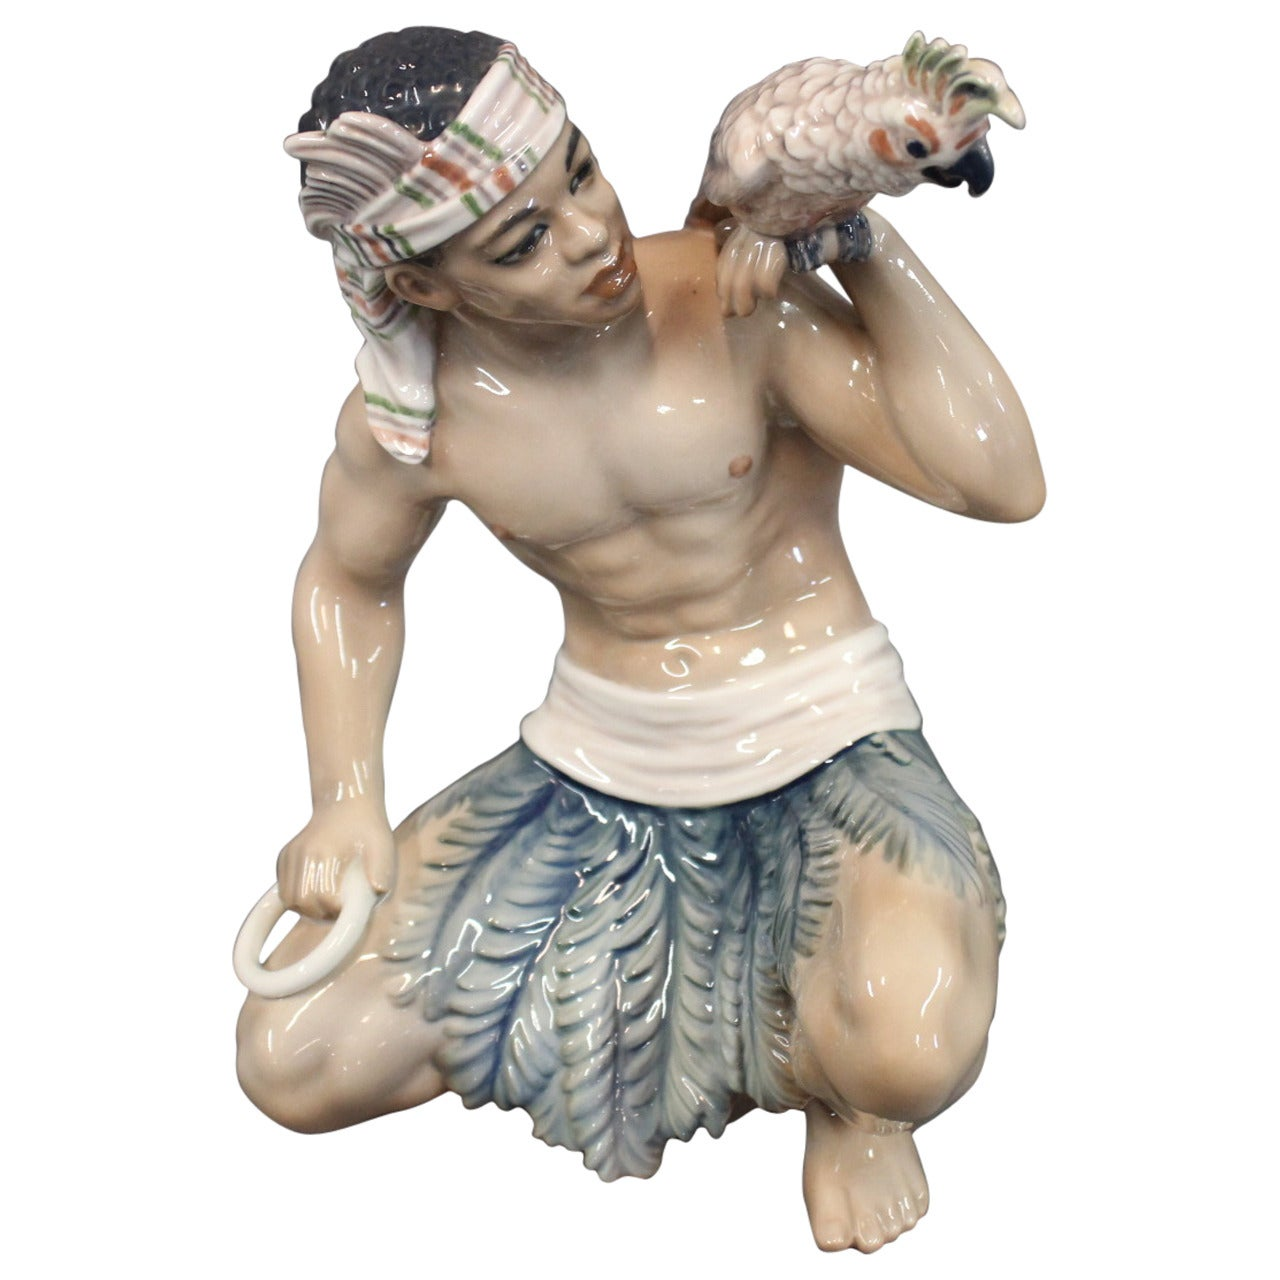 Oriental Porcelain Figurine, Sundanese Man, No 1305 by Dahl Jensen